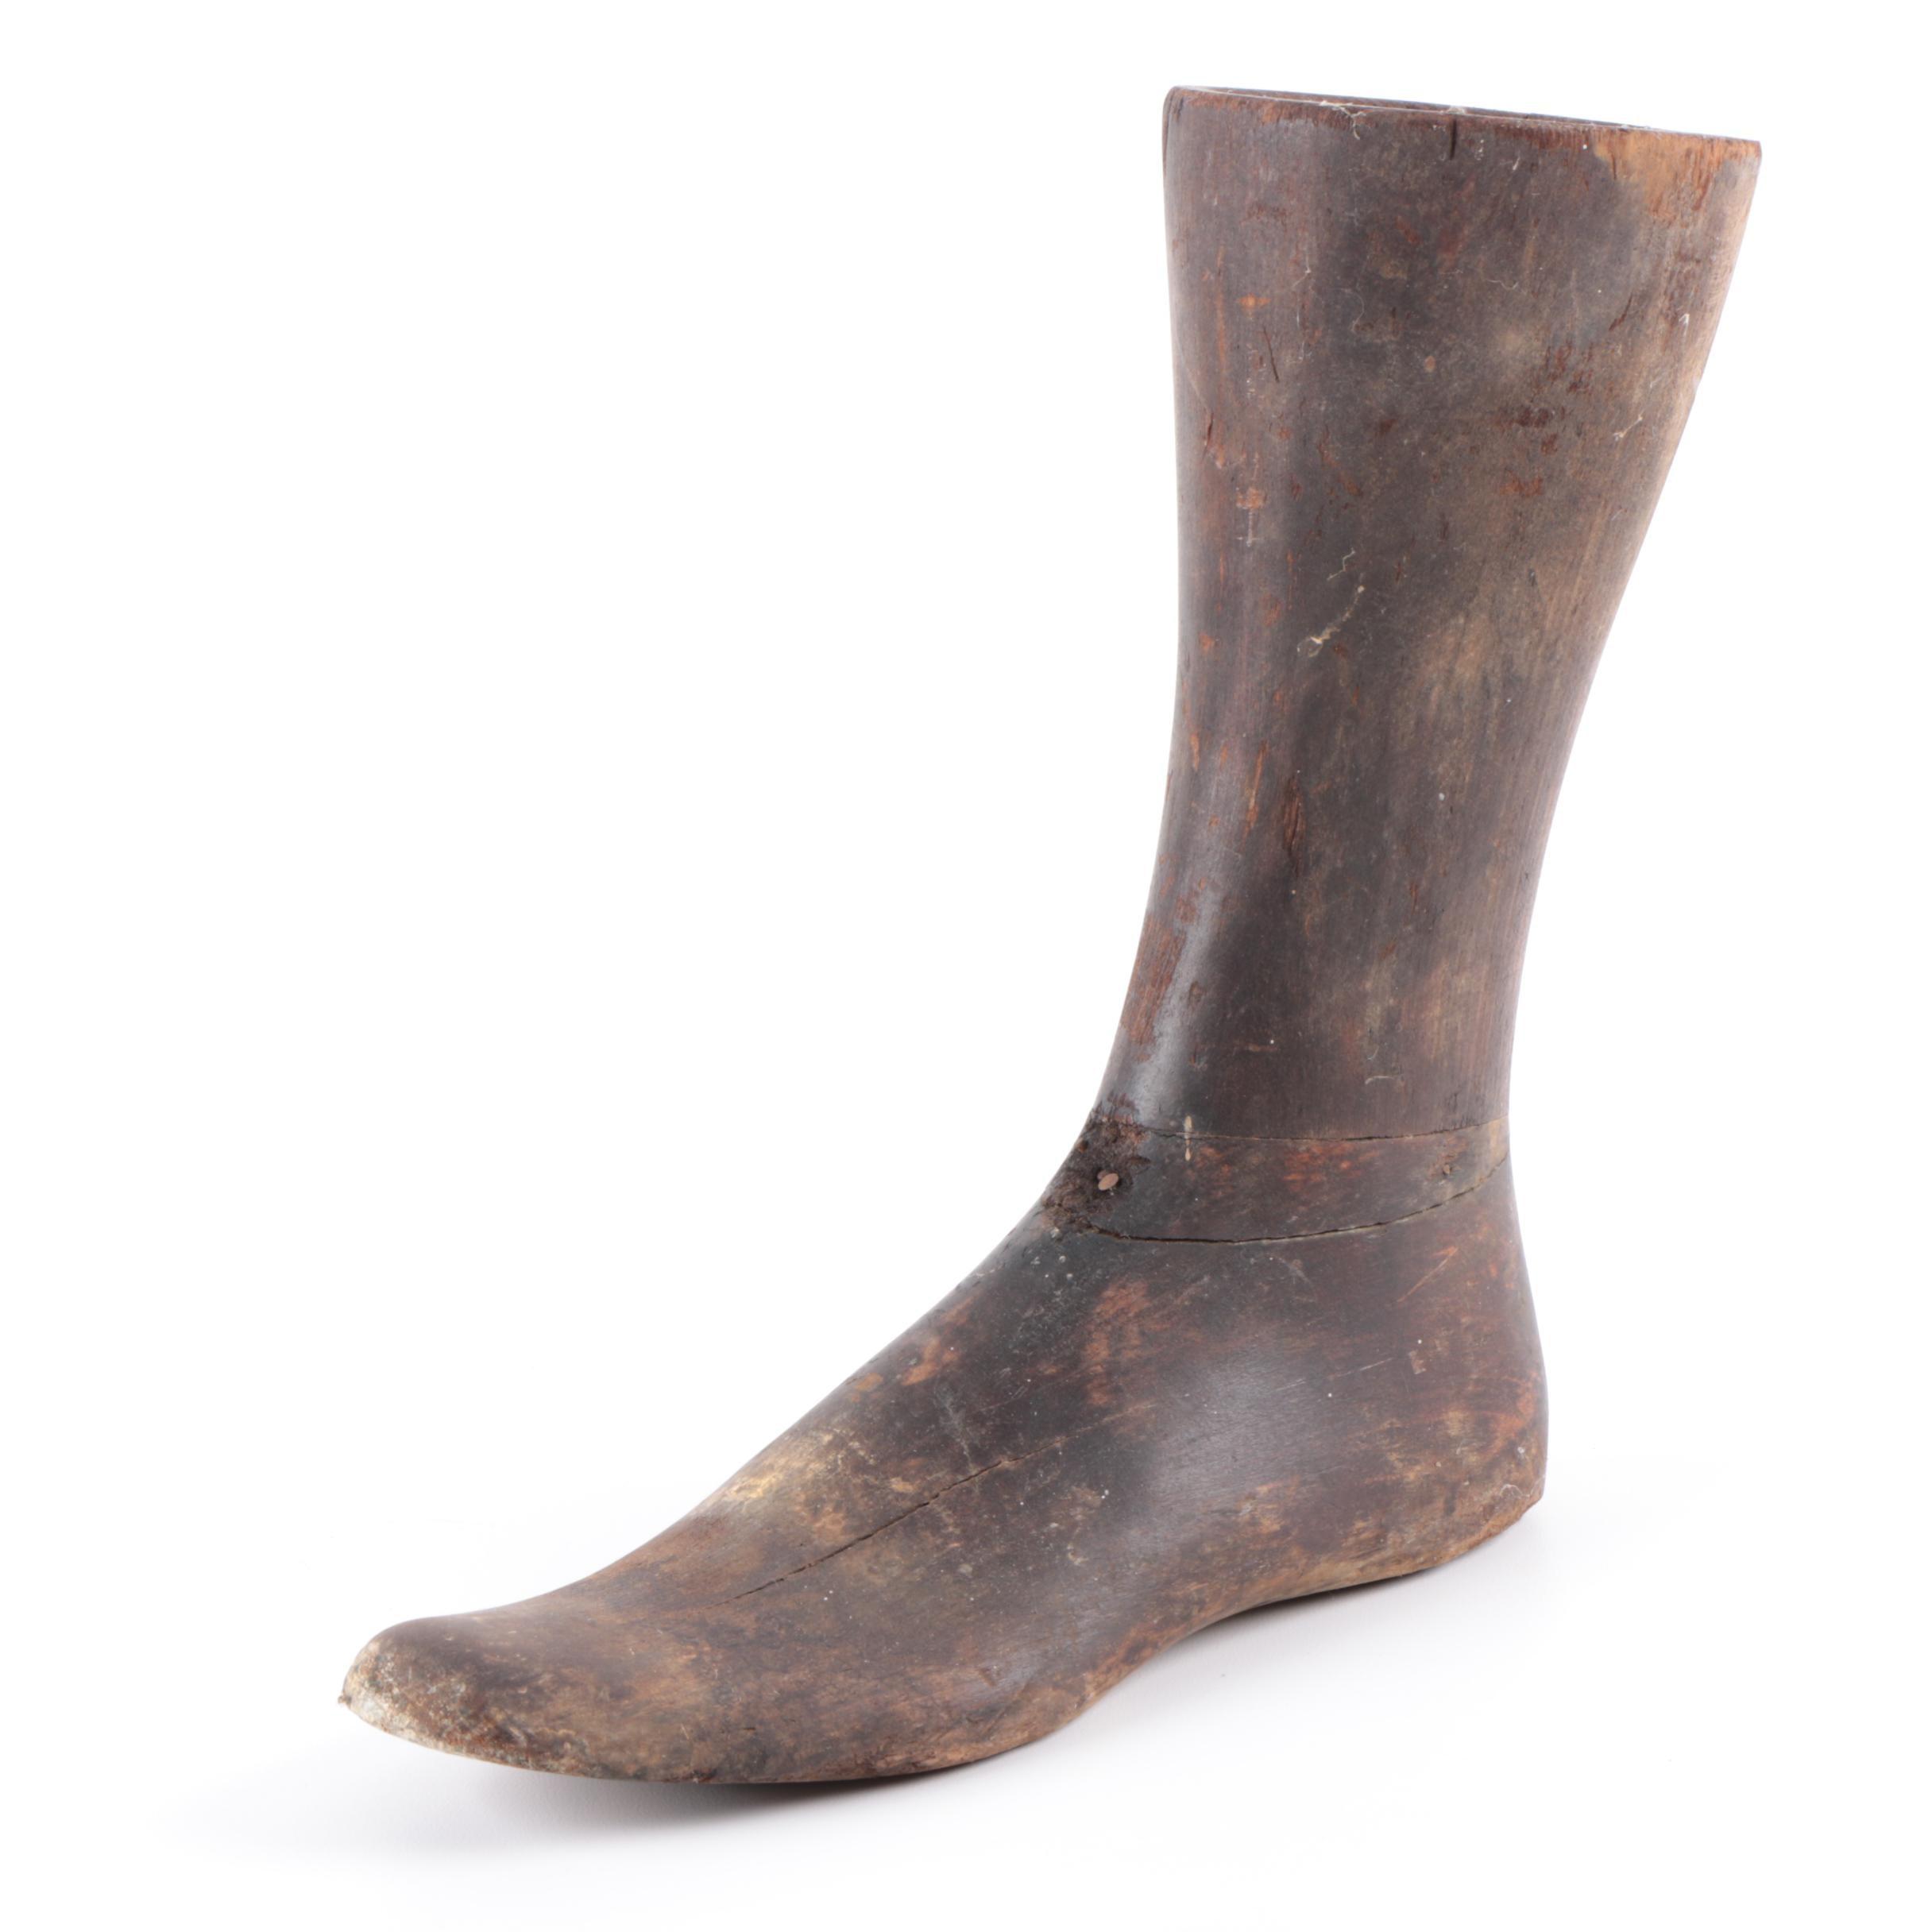 Vintage Wooden Boot Form